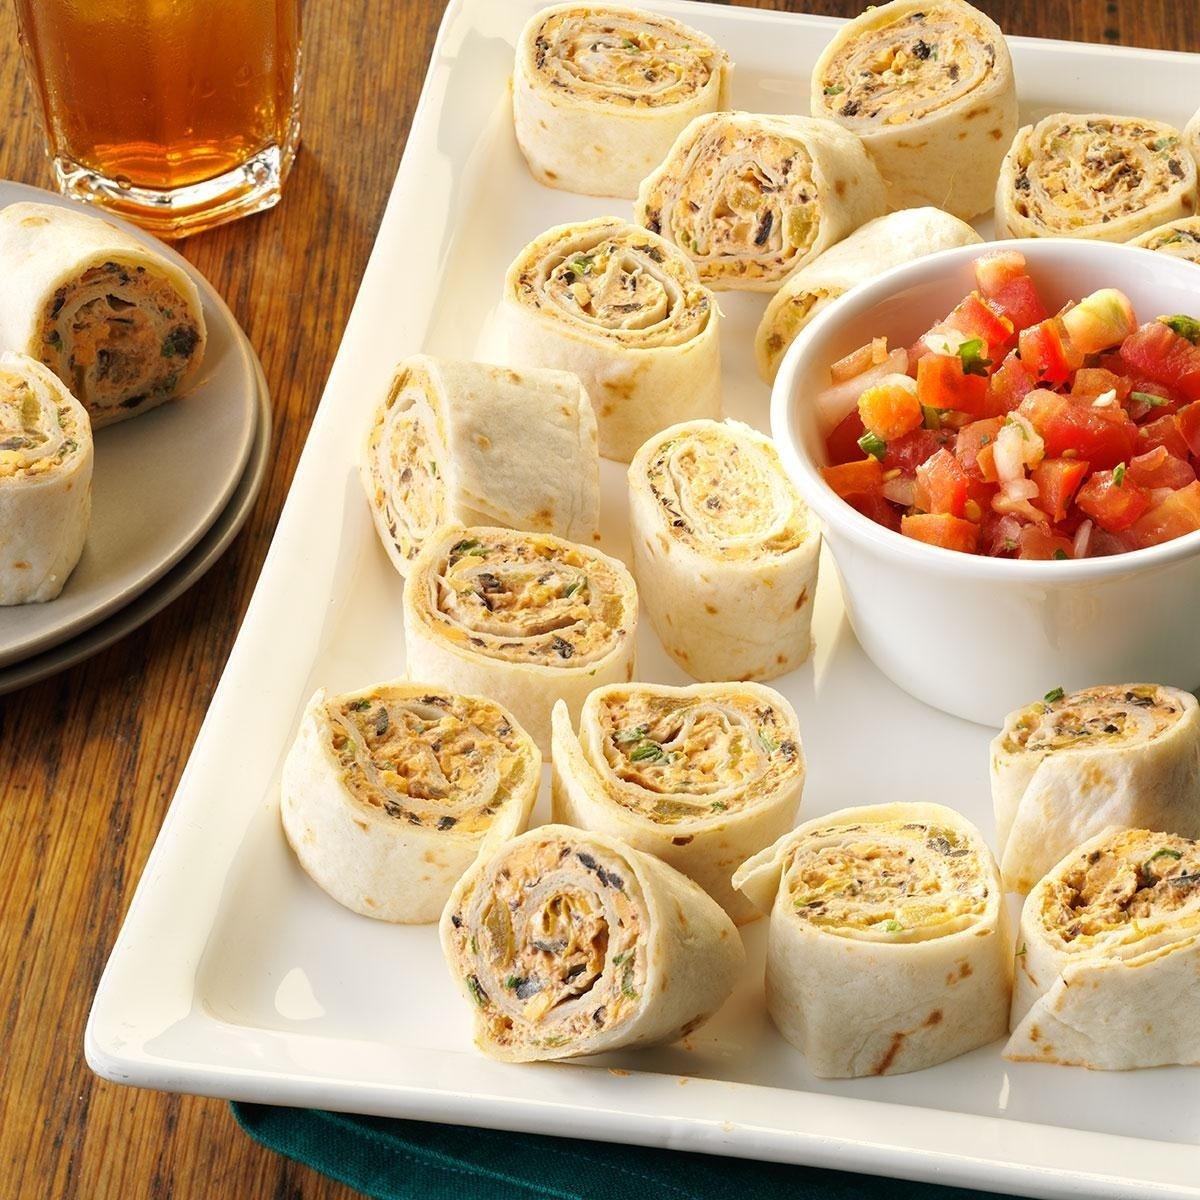 10 Elegant Ideas For Graduation Party Food fiesta pinwheels recipe taste of home 1 2021